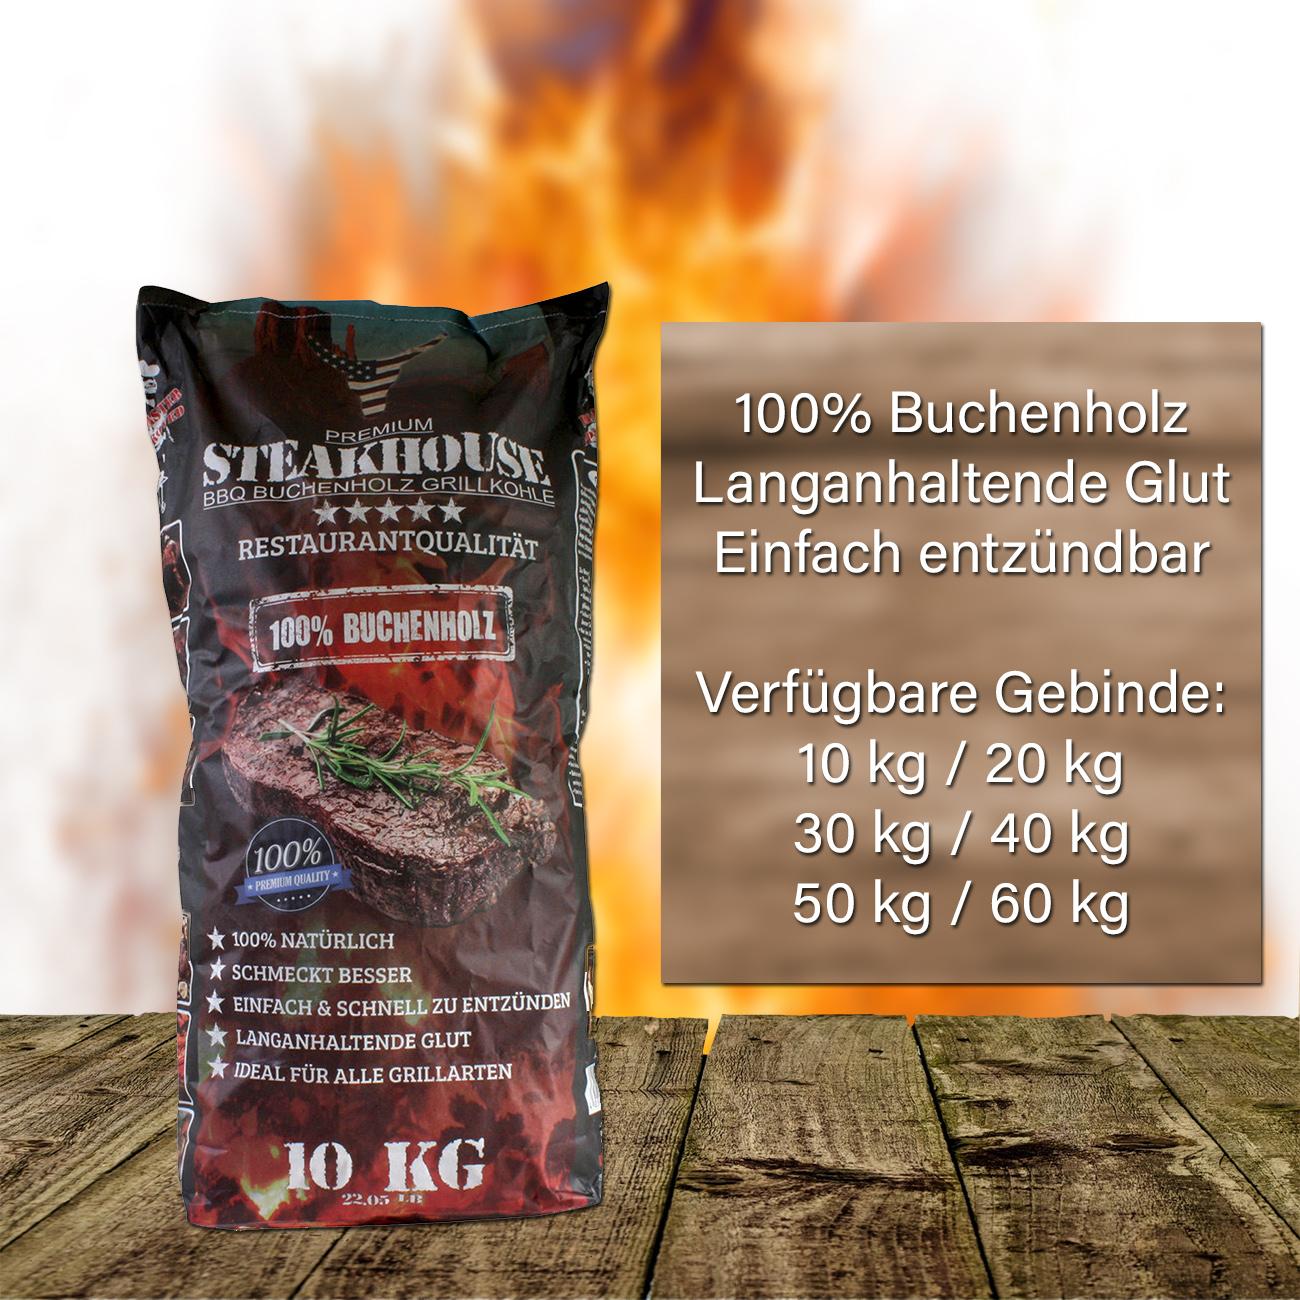 Steakhouse Premium Holzkohle Grillkohle aus 100/% Buchenholz 40 kg 4x 10 kg